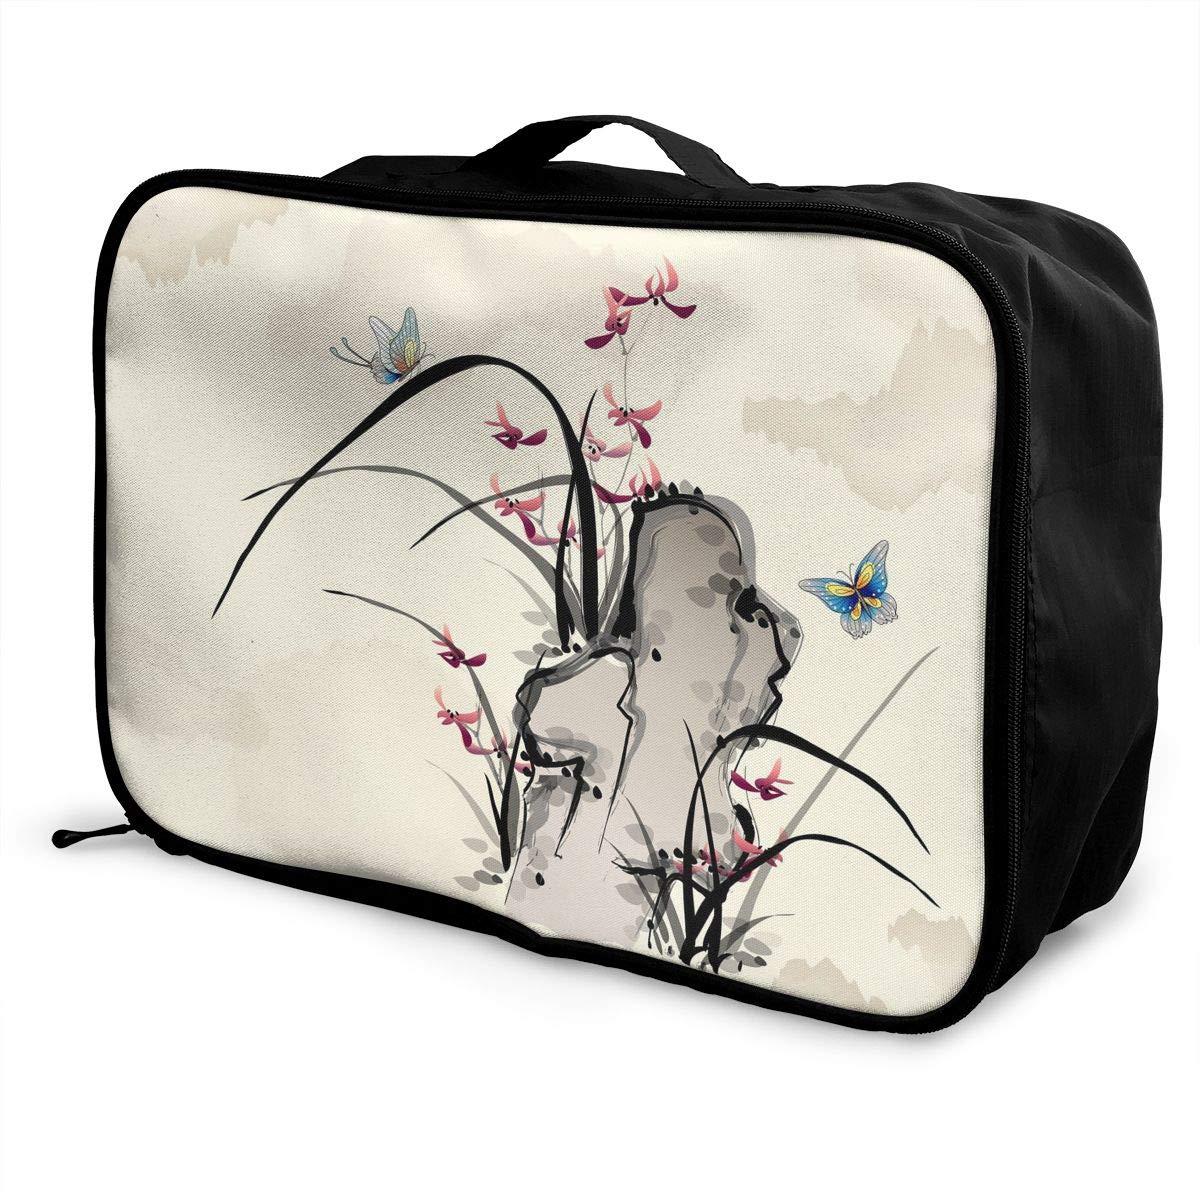 Travel Luggage Duffle Bag Lightweight Portable Handbag Flowers Butterfly Large Capacity Waterproof Foldable Storage Tote